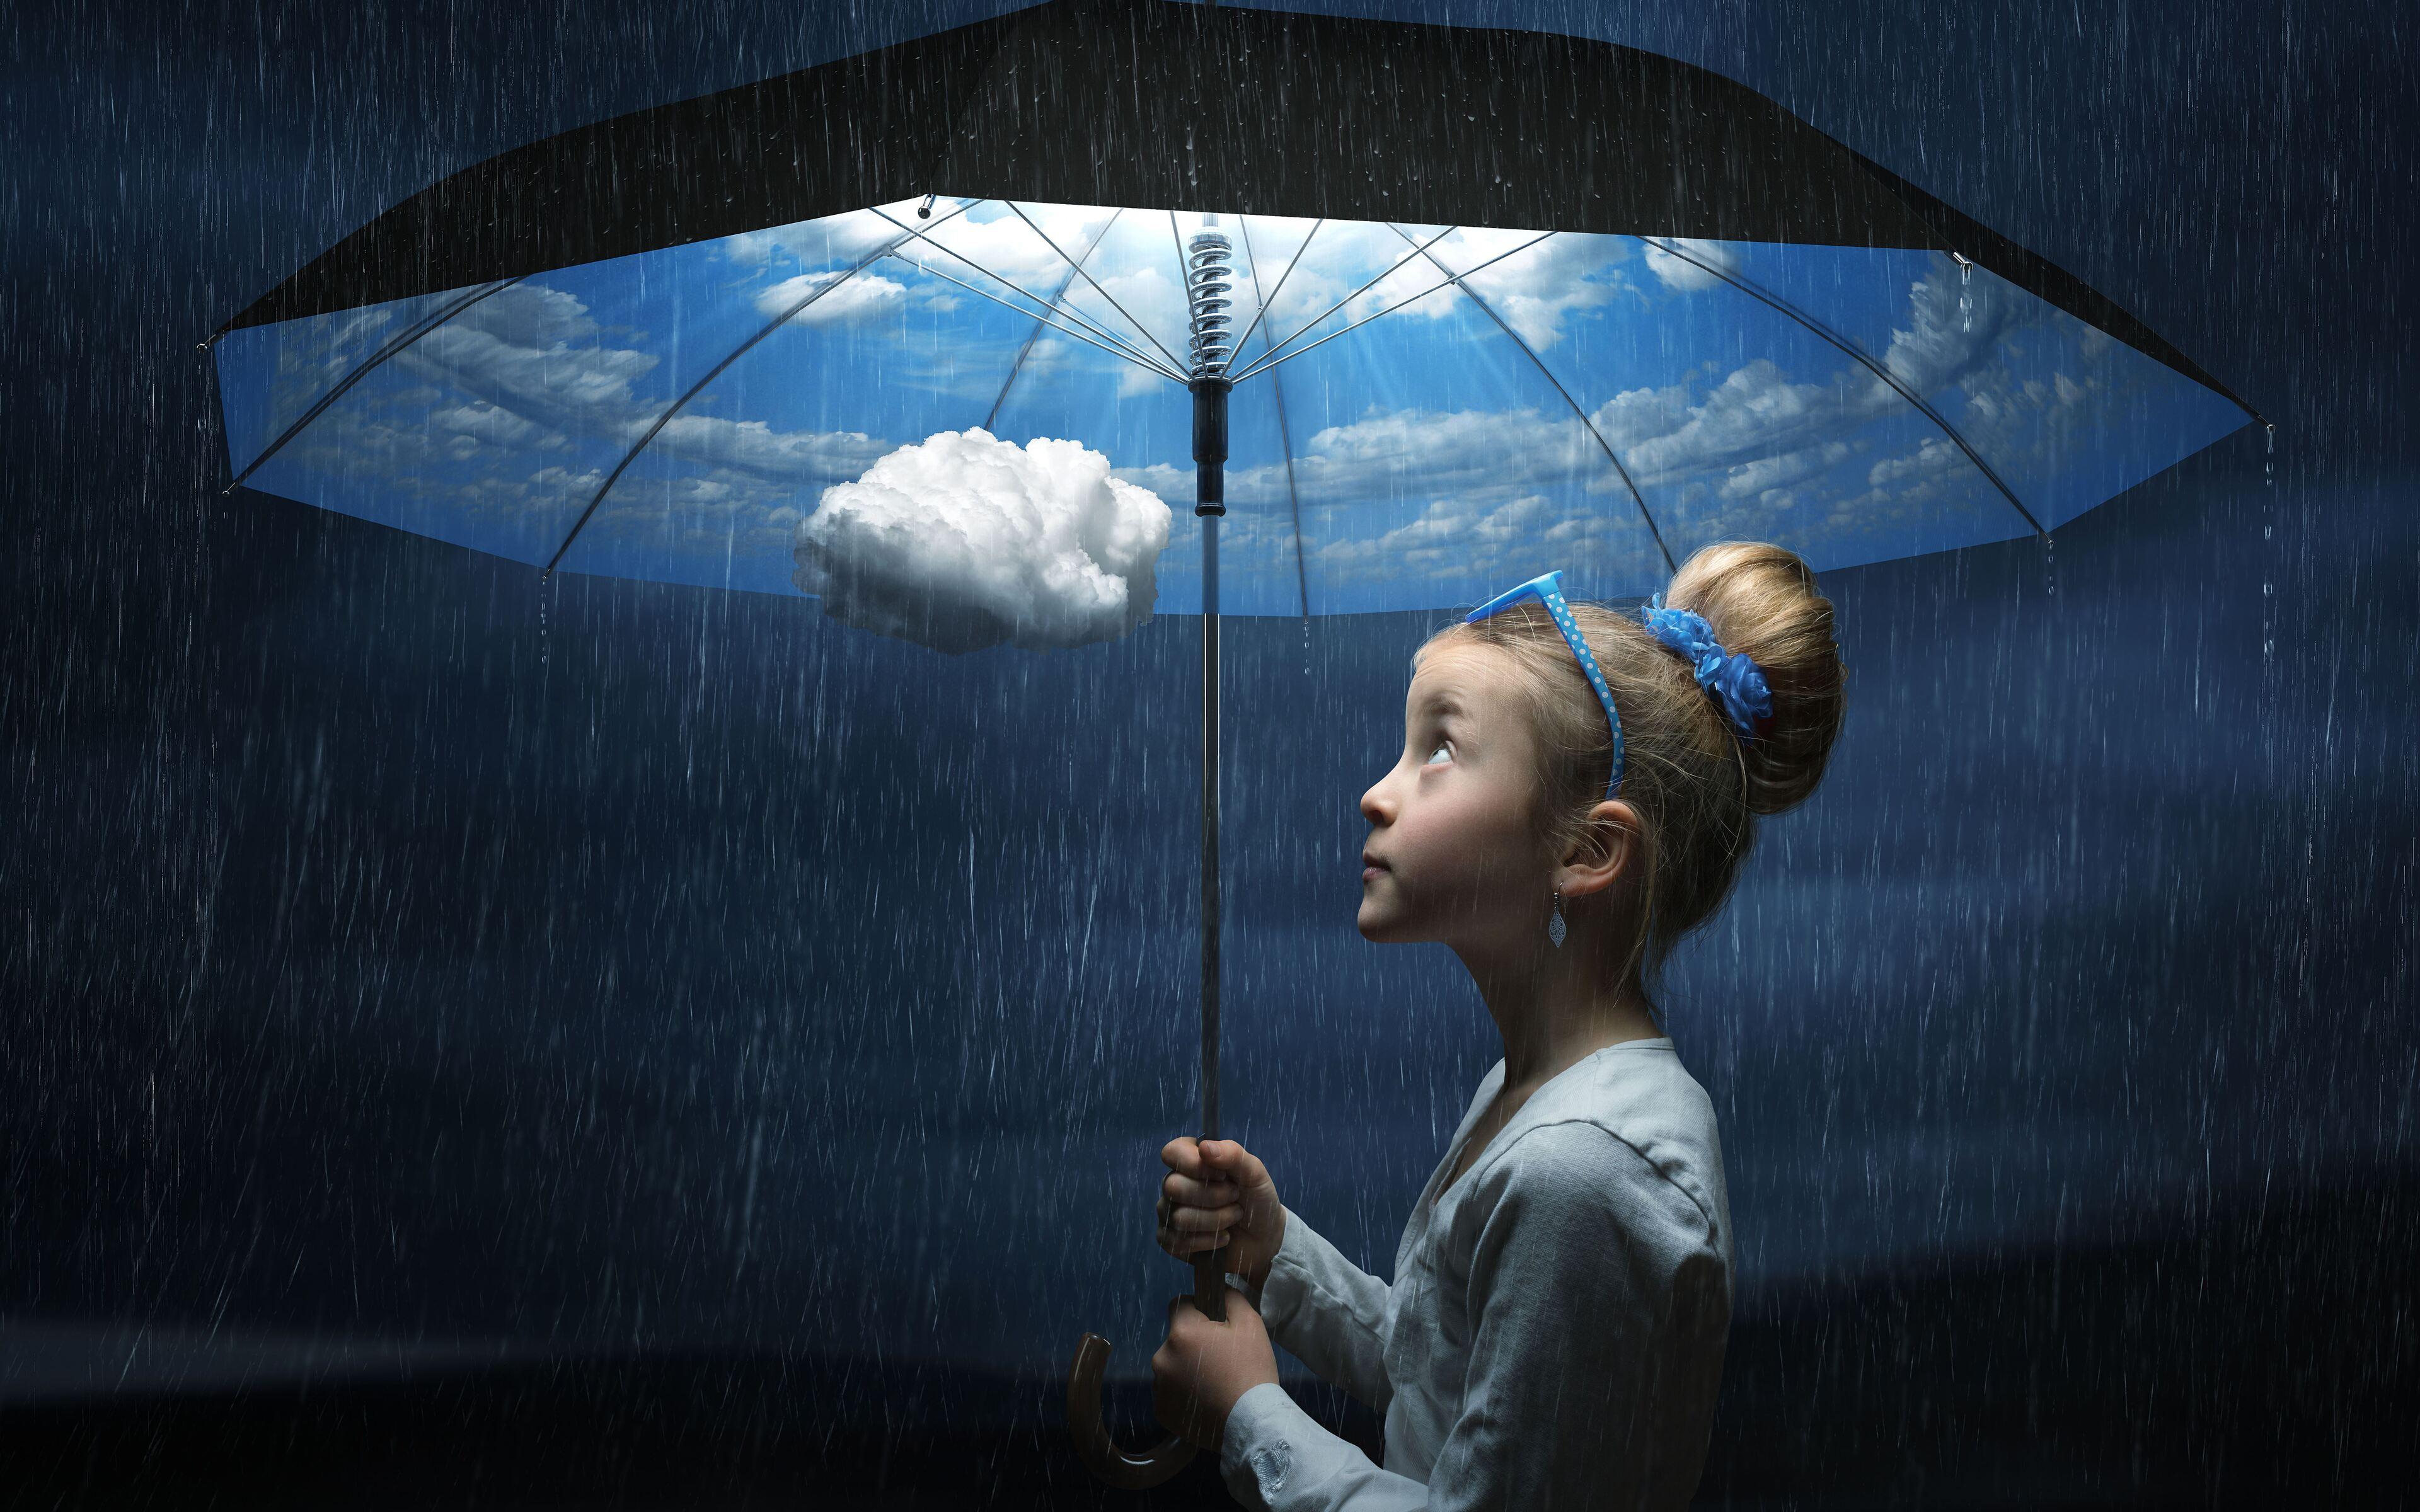 child-clouds-minimalism.jpg